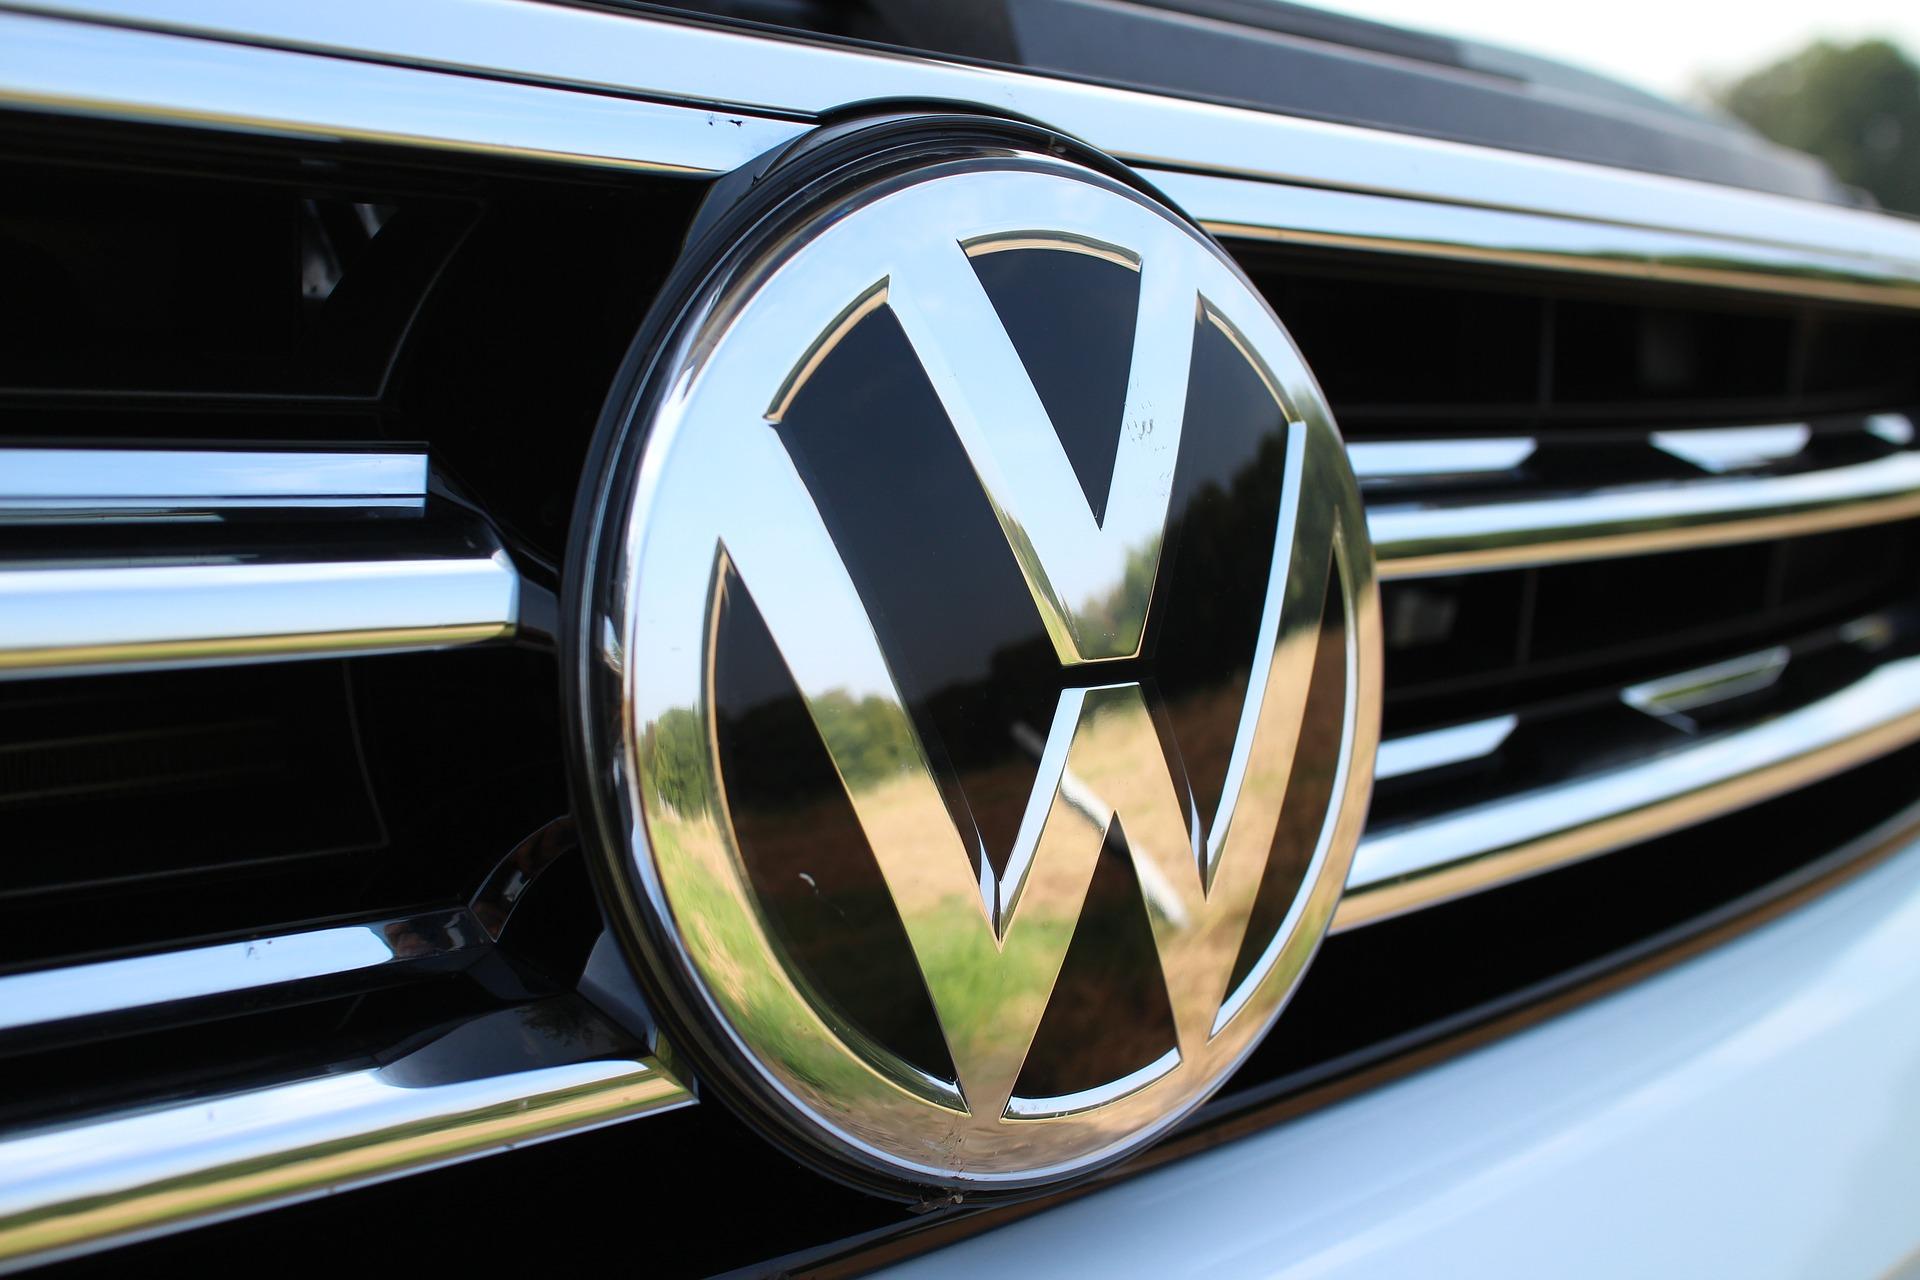 Abgasskandal VW